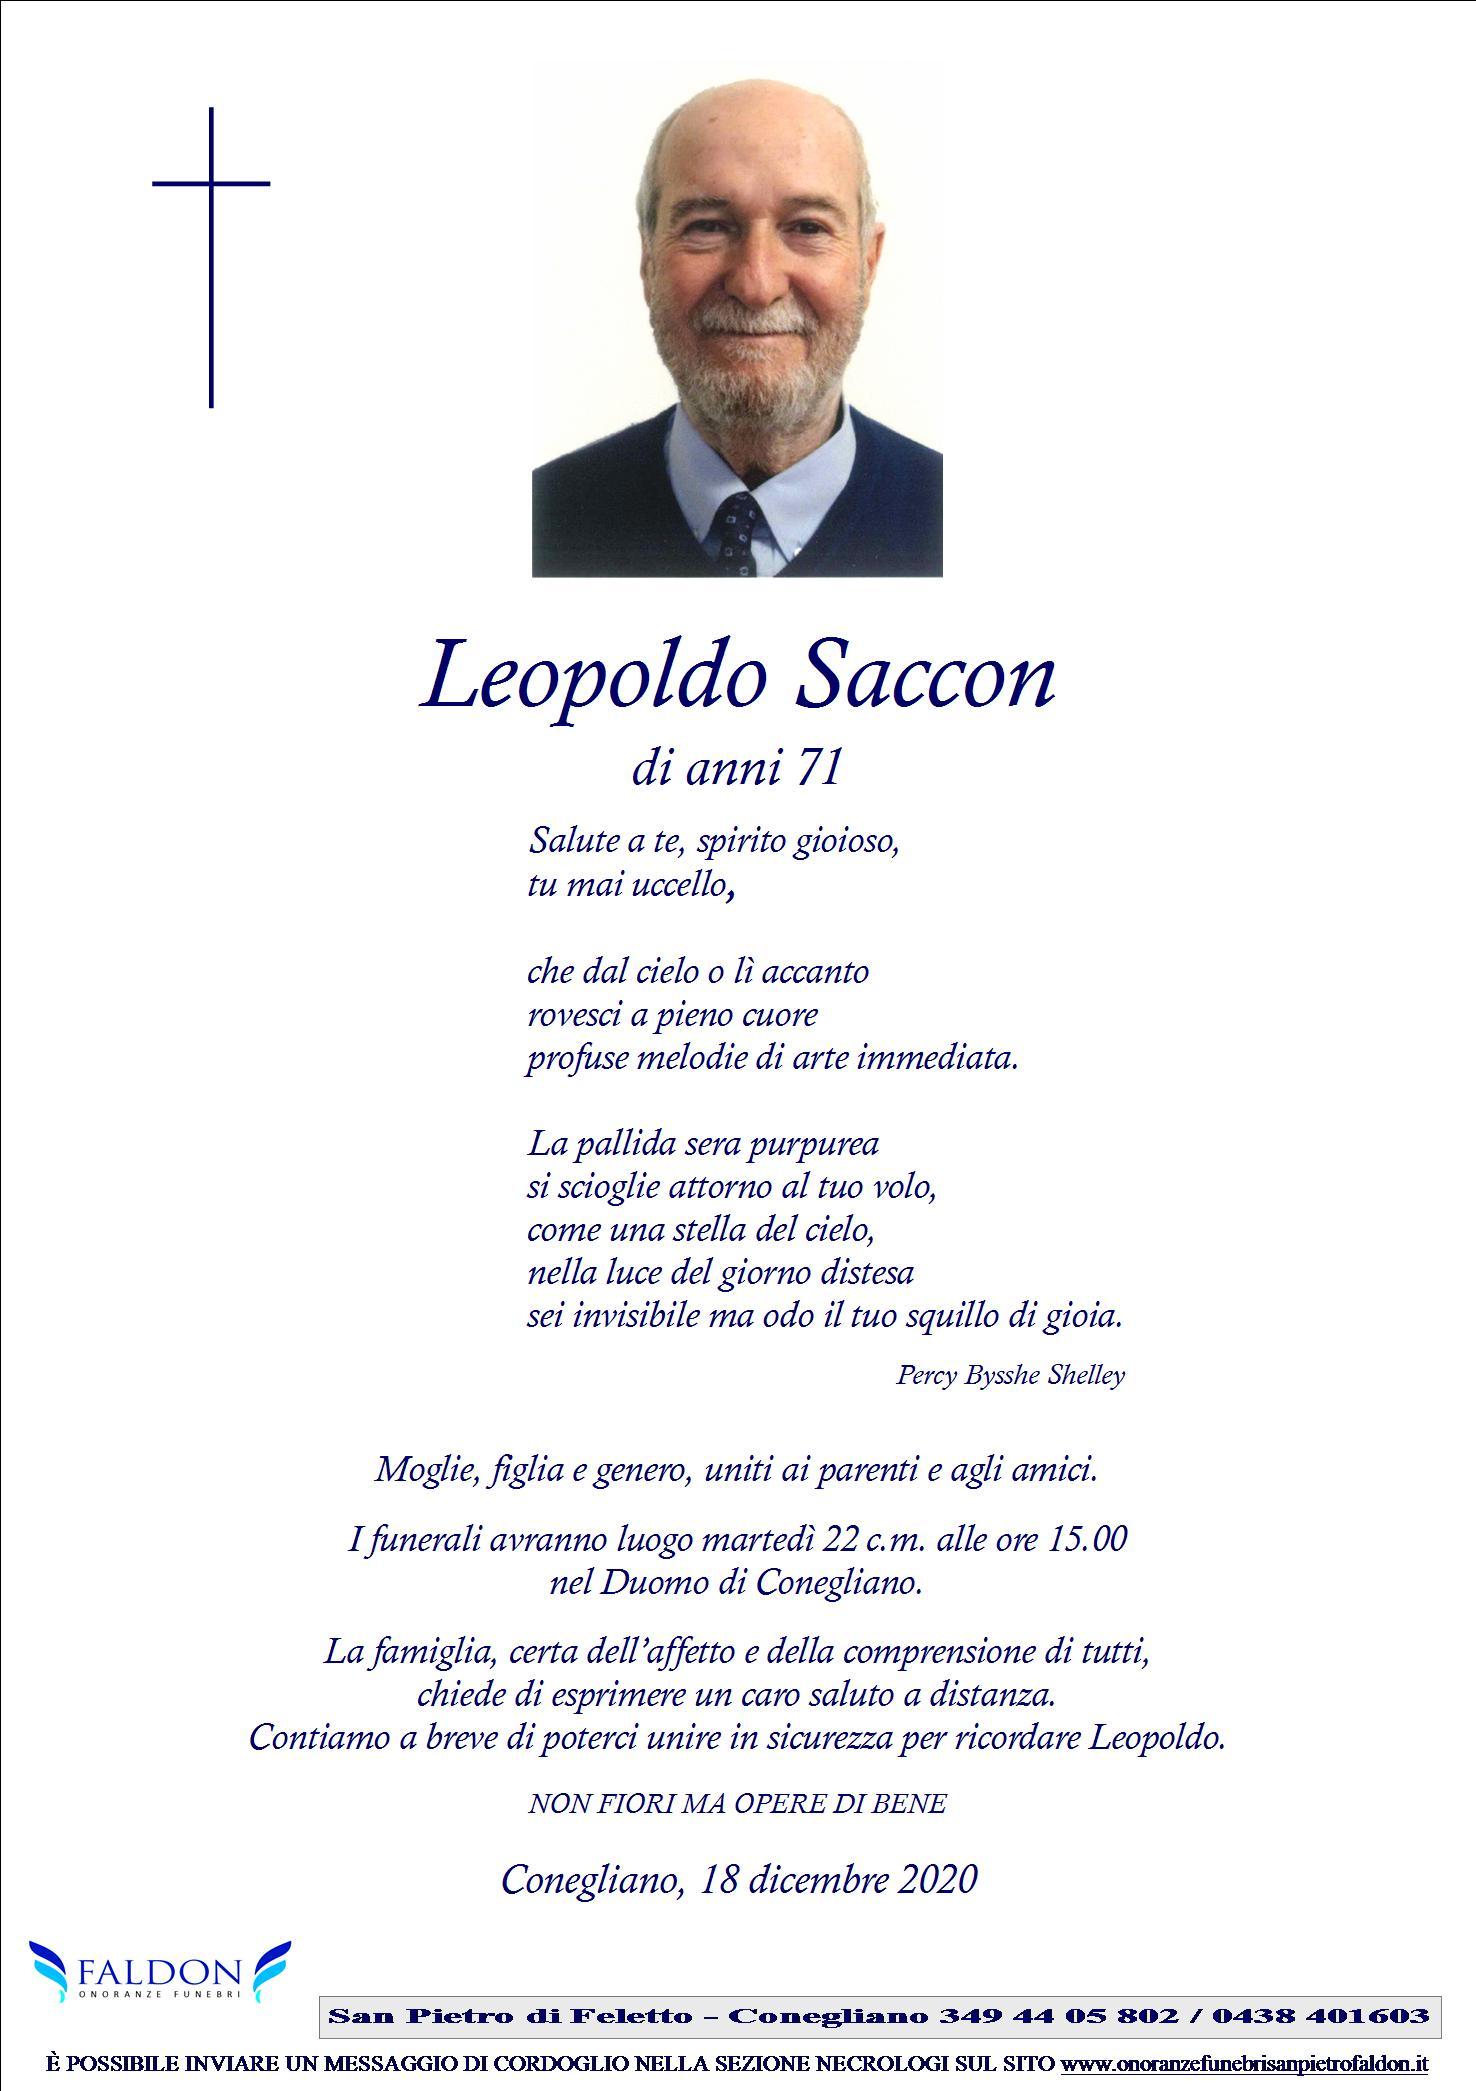 Leopoldo Saccon